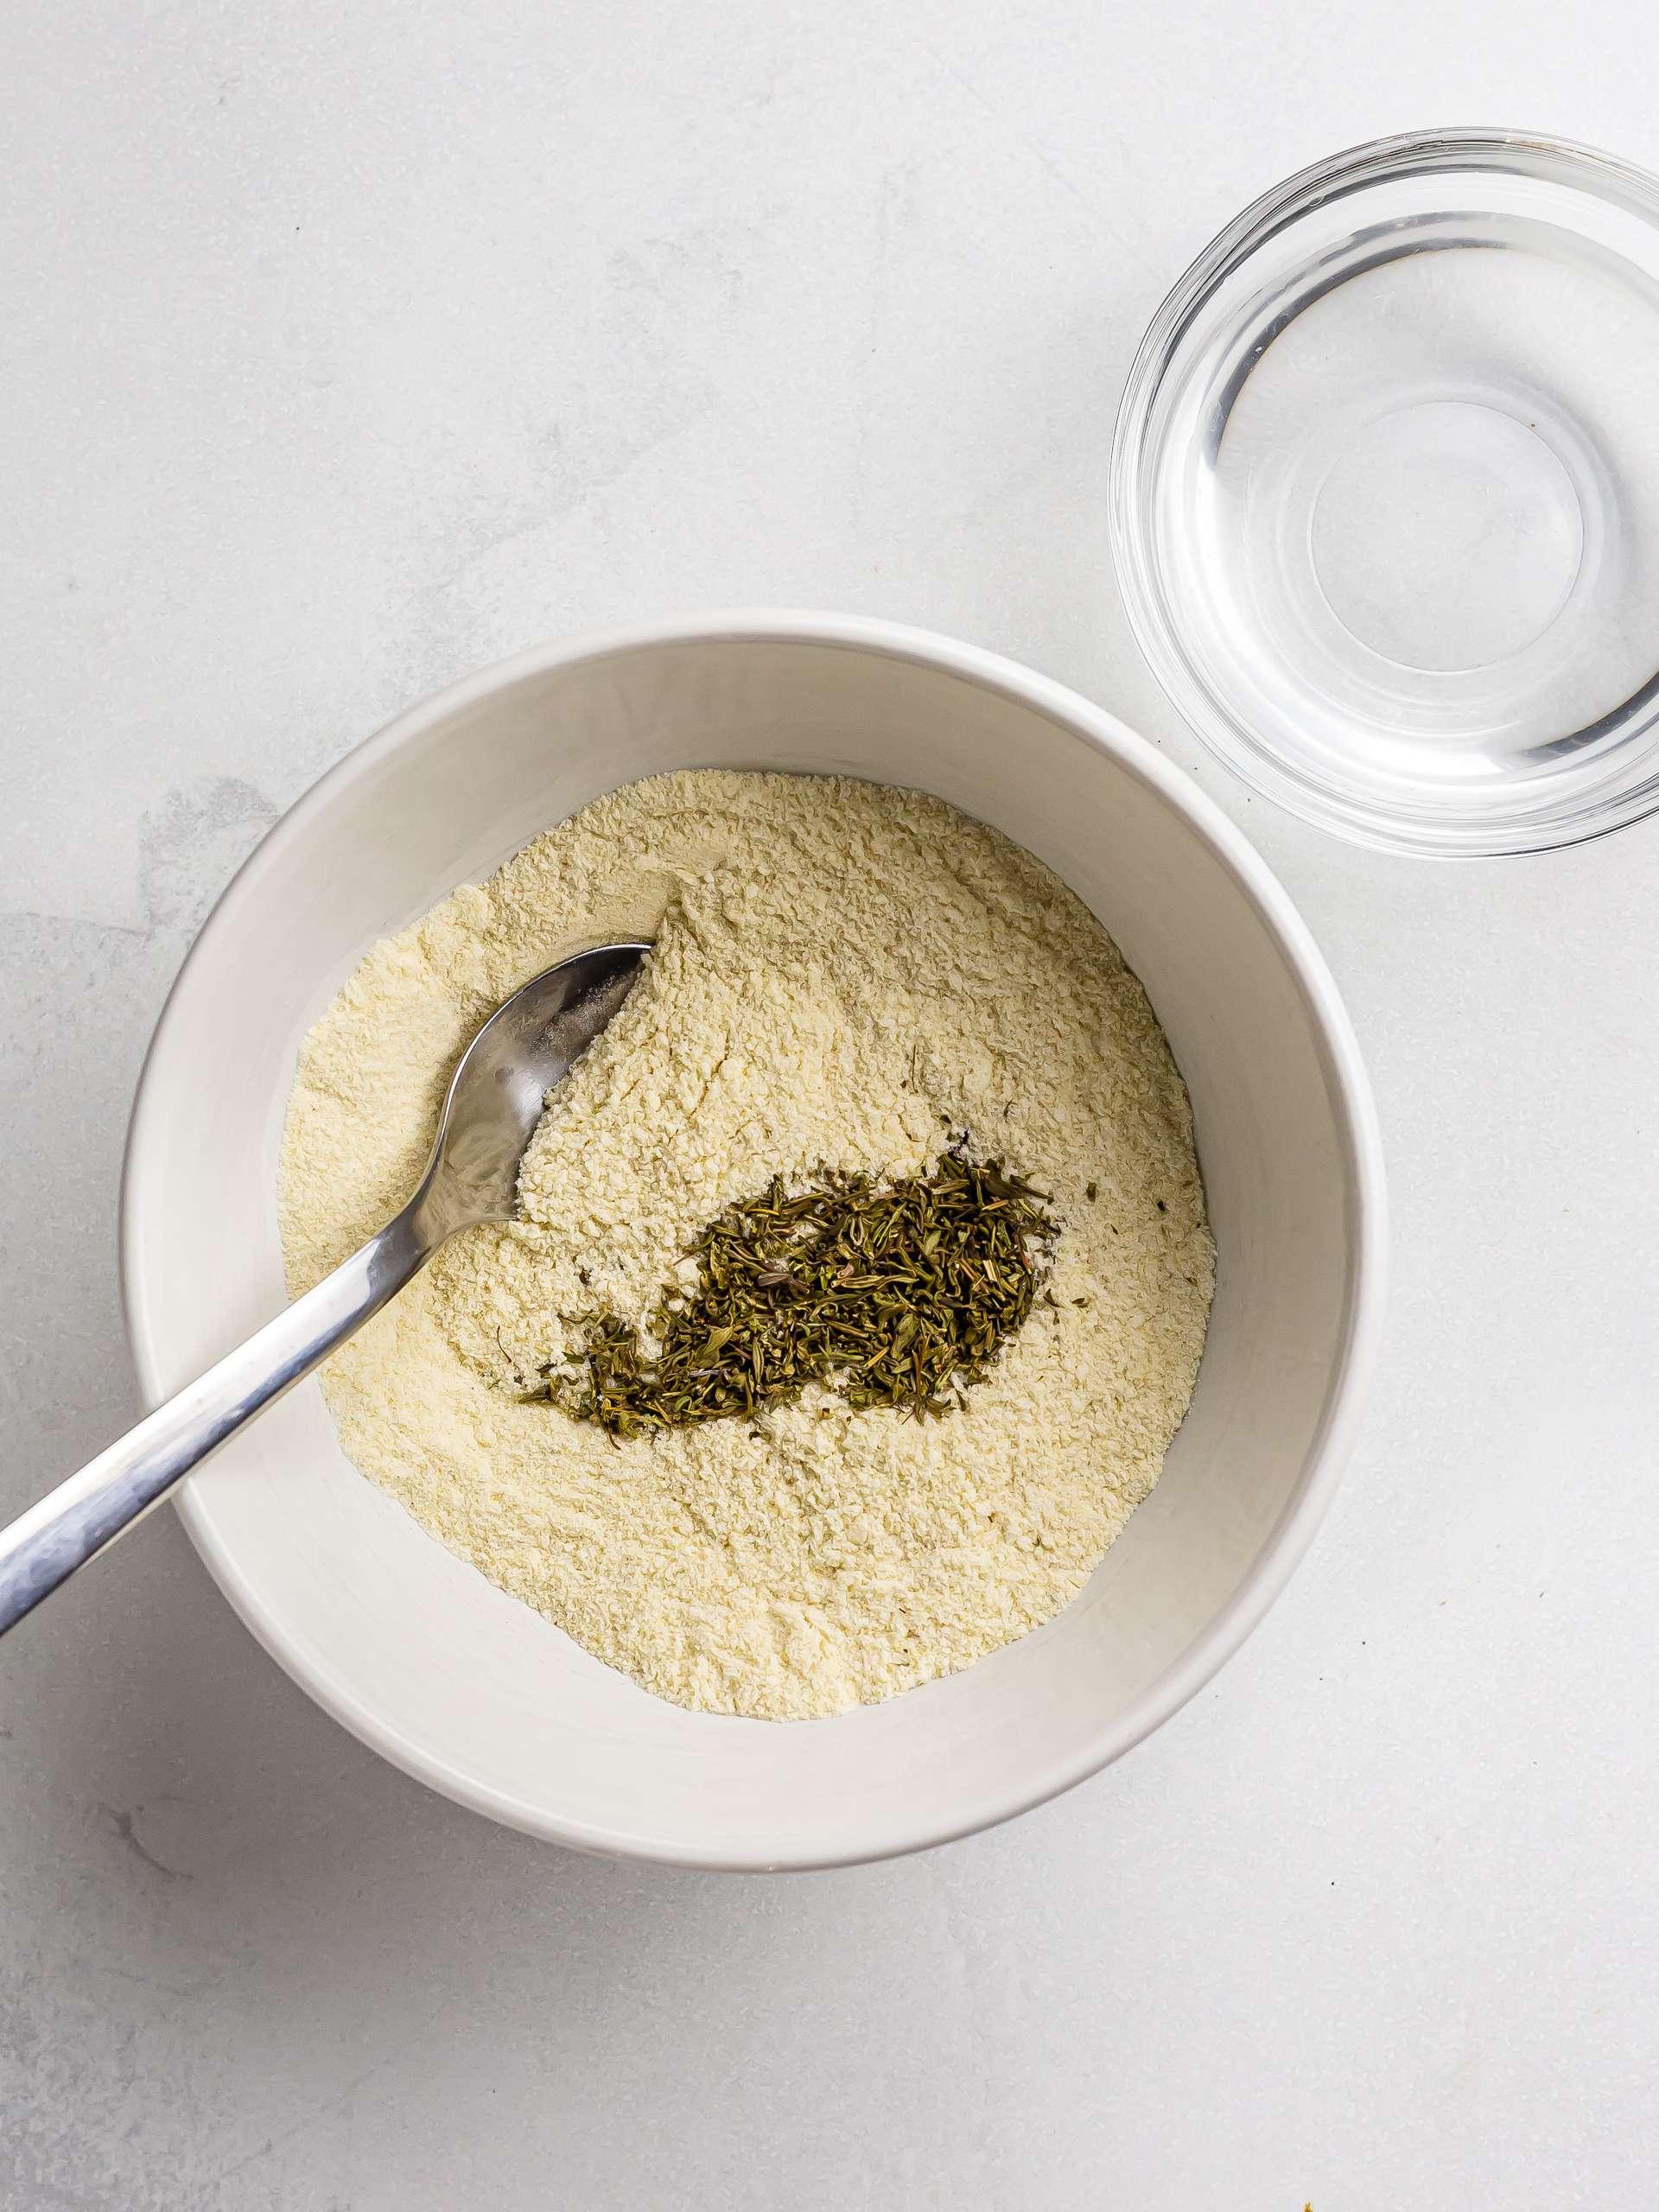 jamaican cornmeal dumpling ingredients